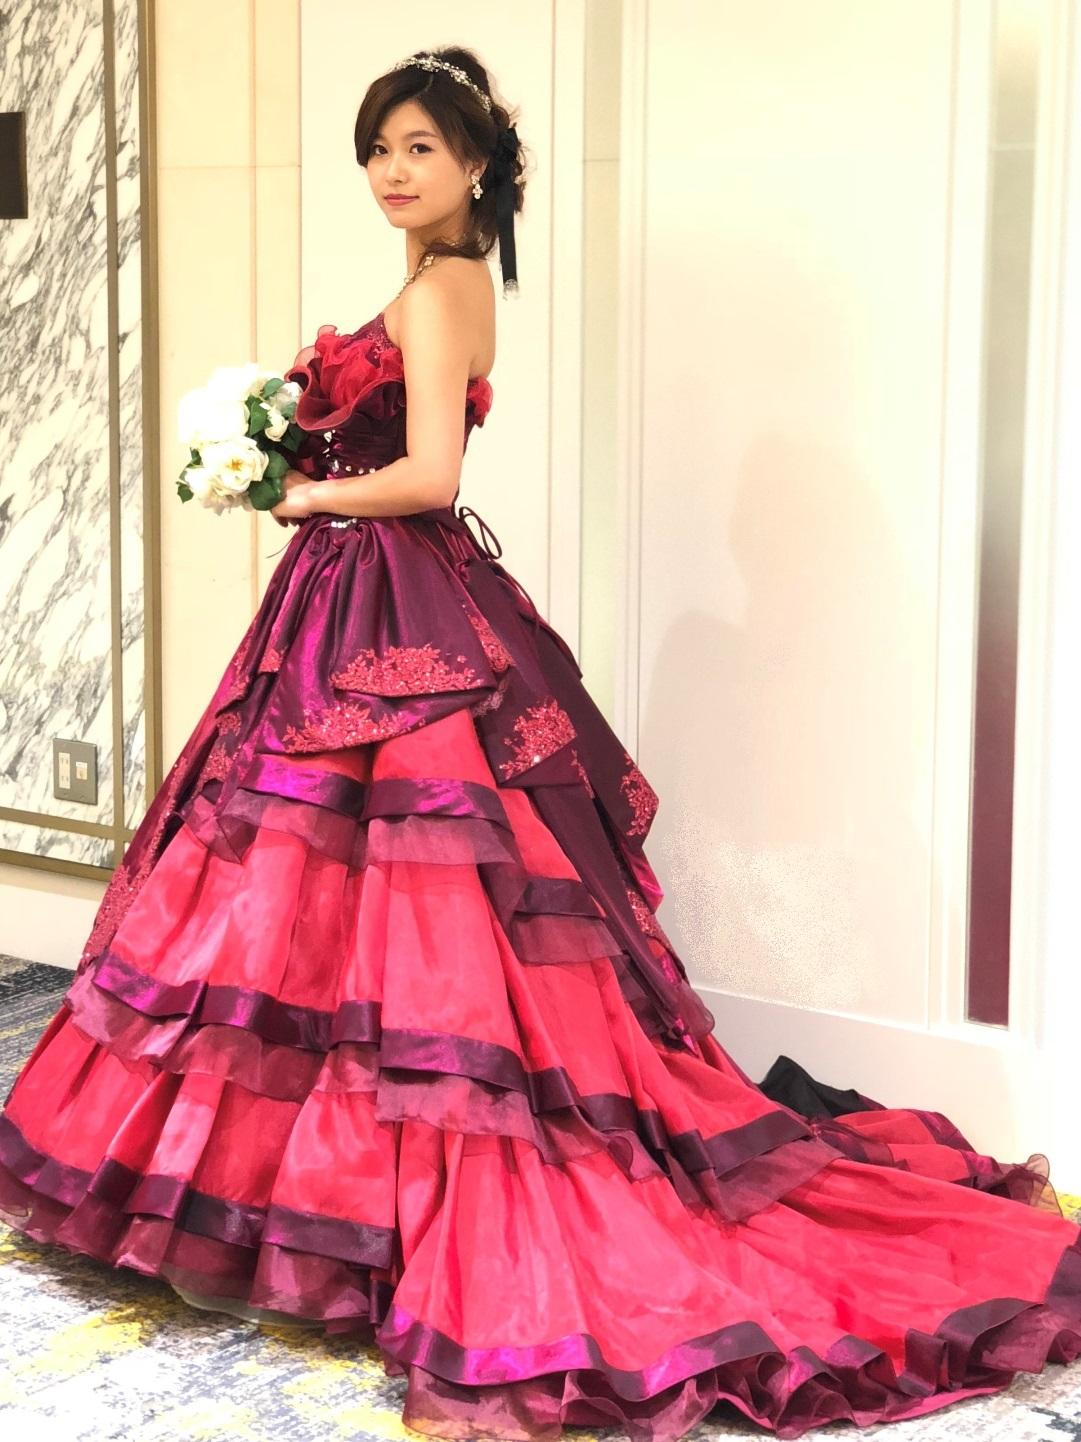 cc5cc7e310f9e 滋賀県でウェディングドレスやカラードレス・色打掛等を格安レンタルする ...